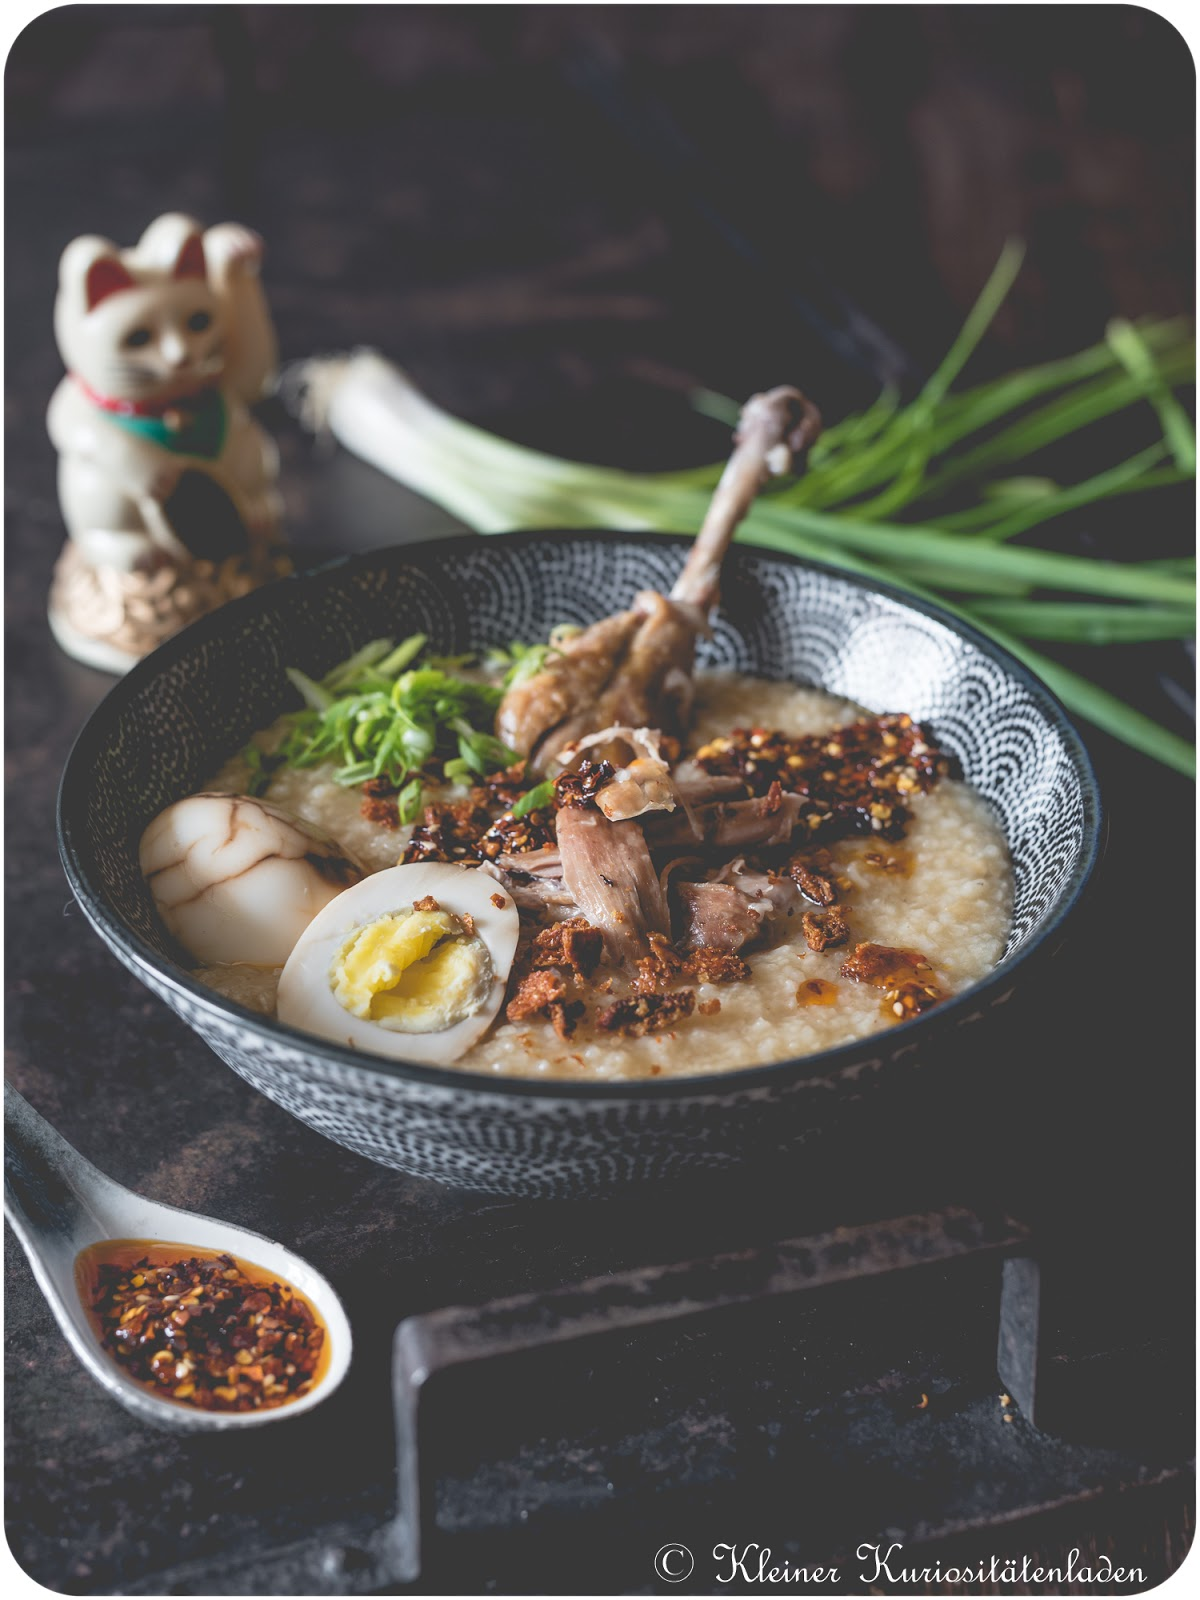 Chicken Congee | Jook | 粥 | Chinesisches Reis-Porridge